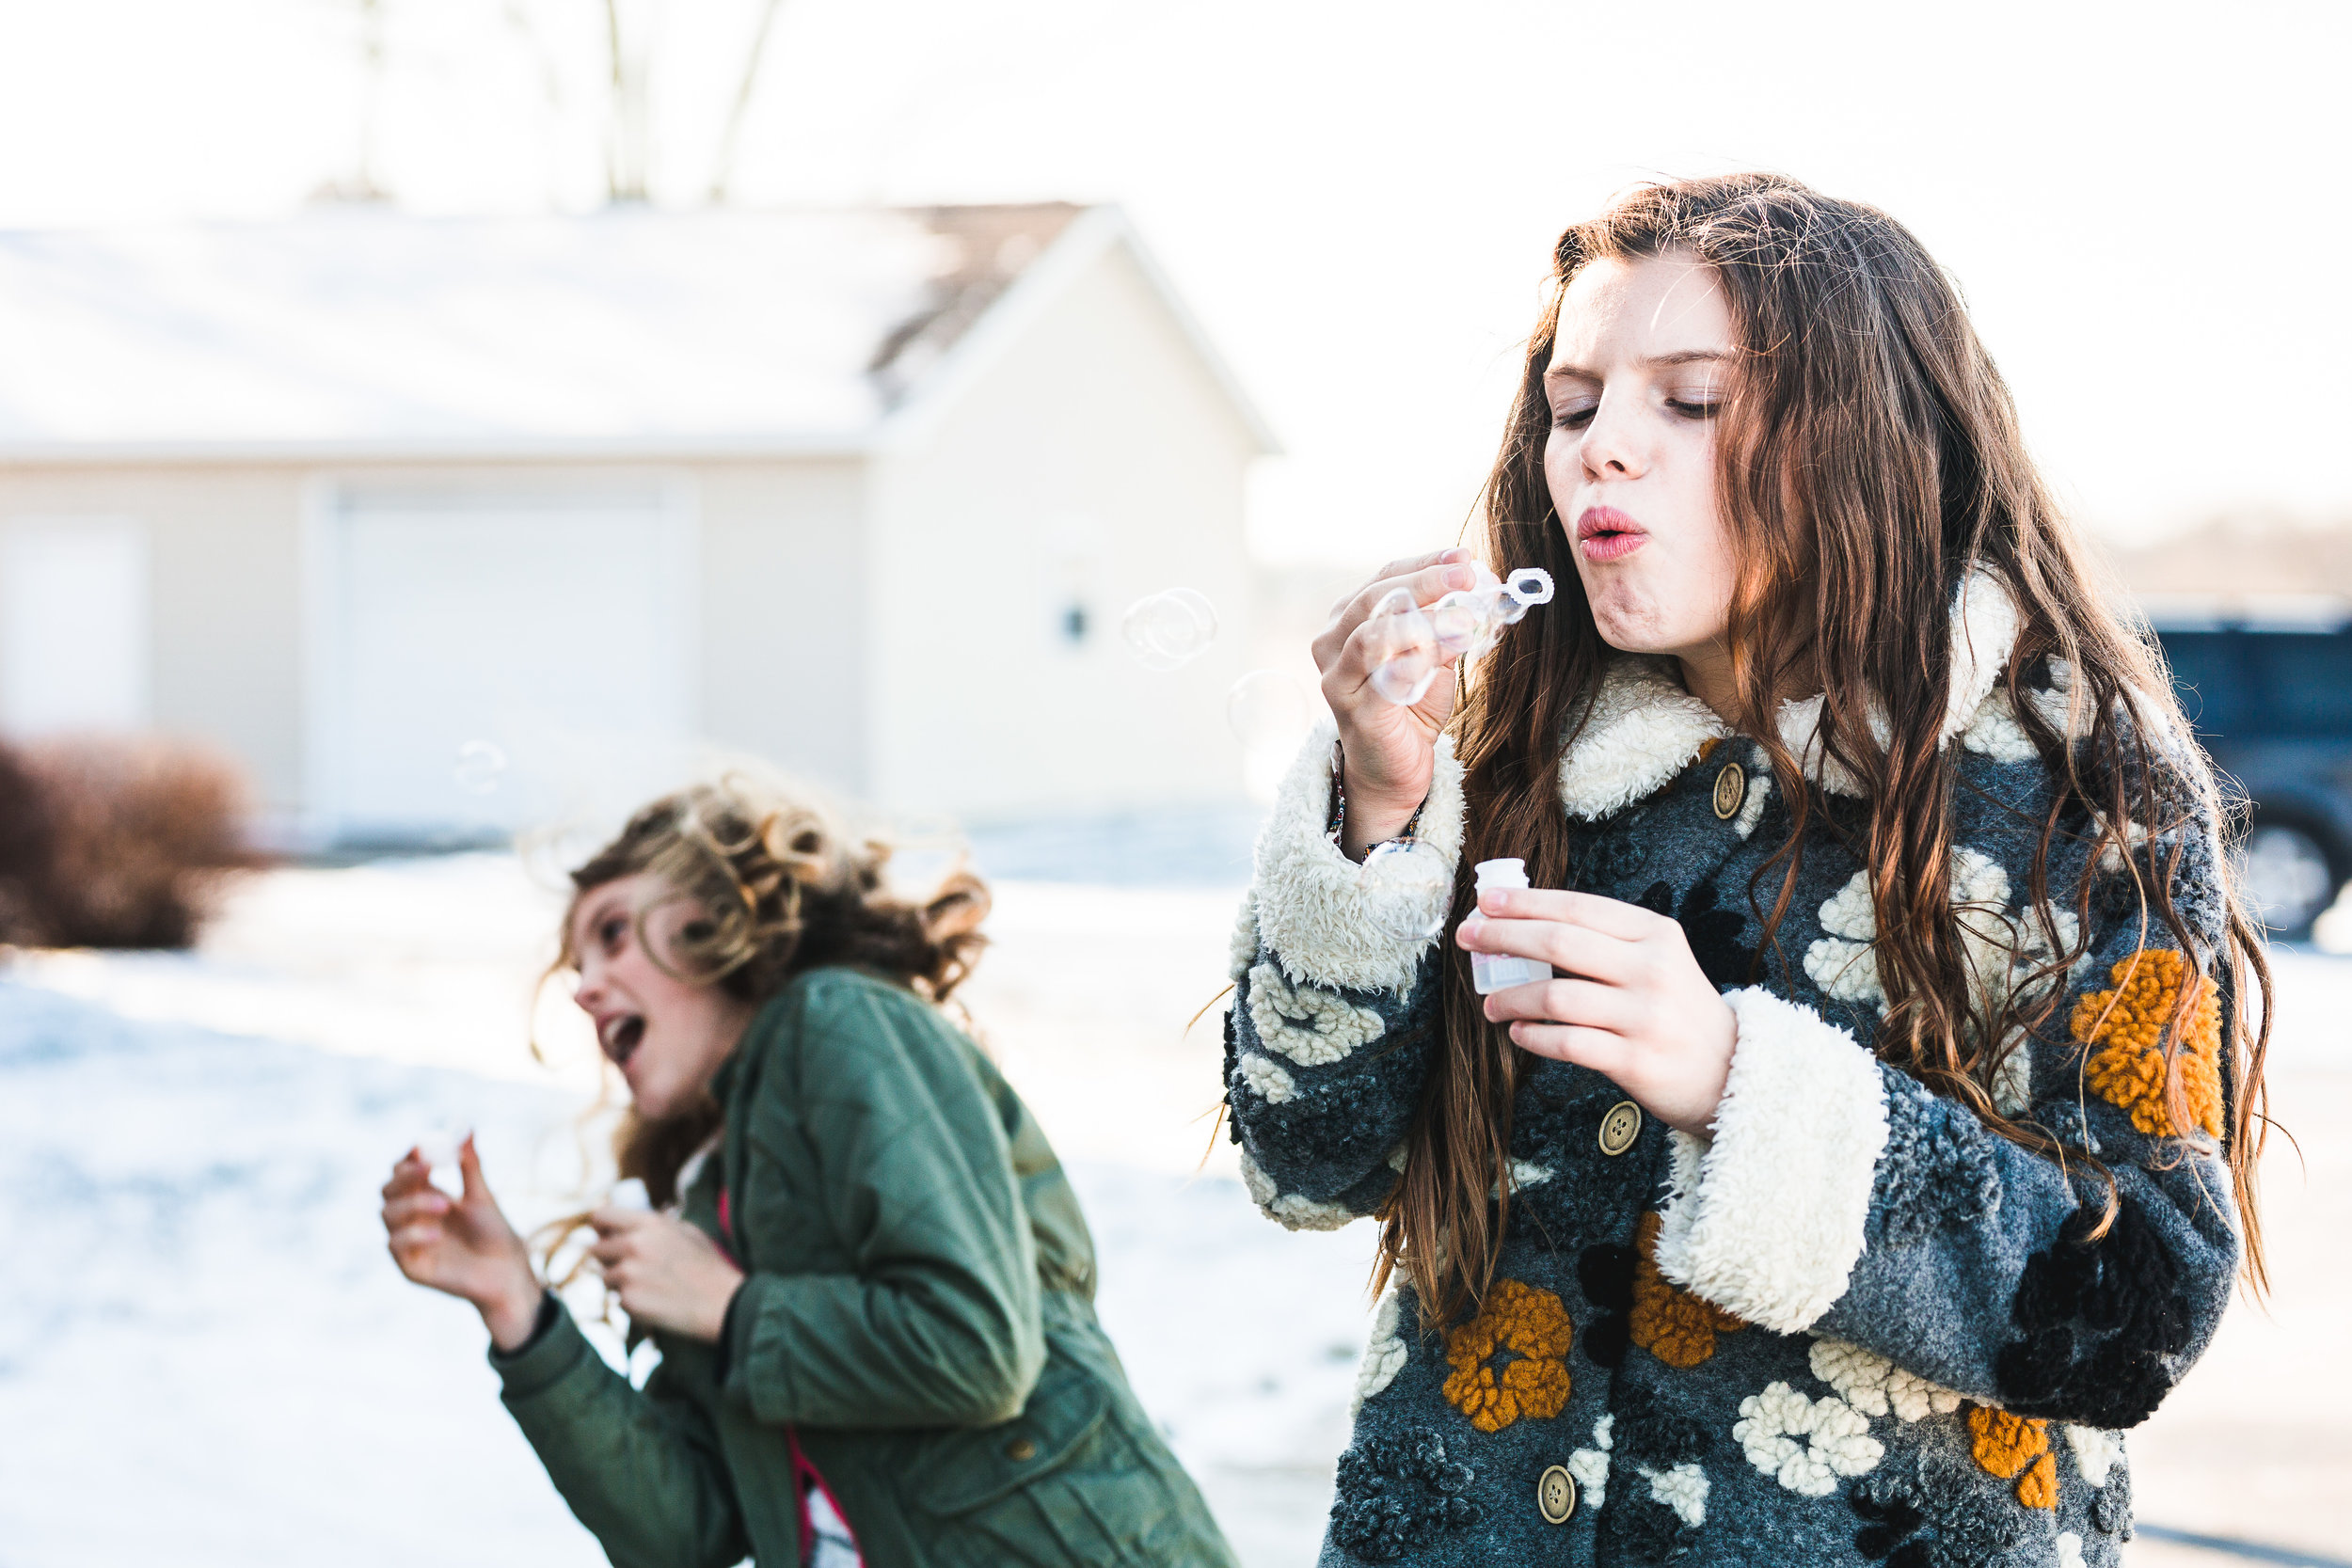 st-louis-photographer-winter-wedding-443.jpg